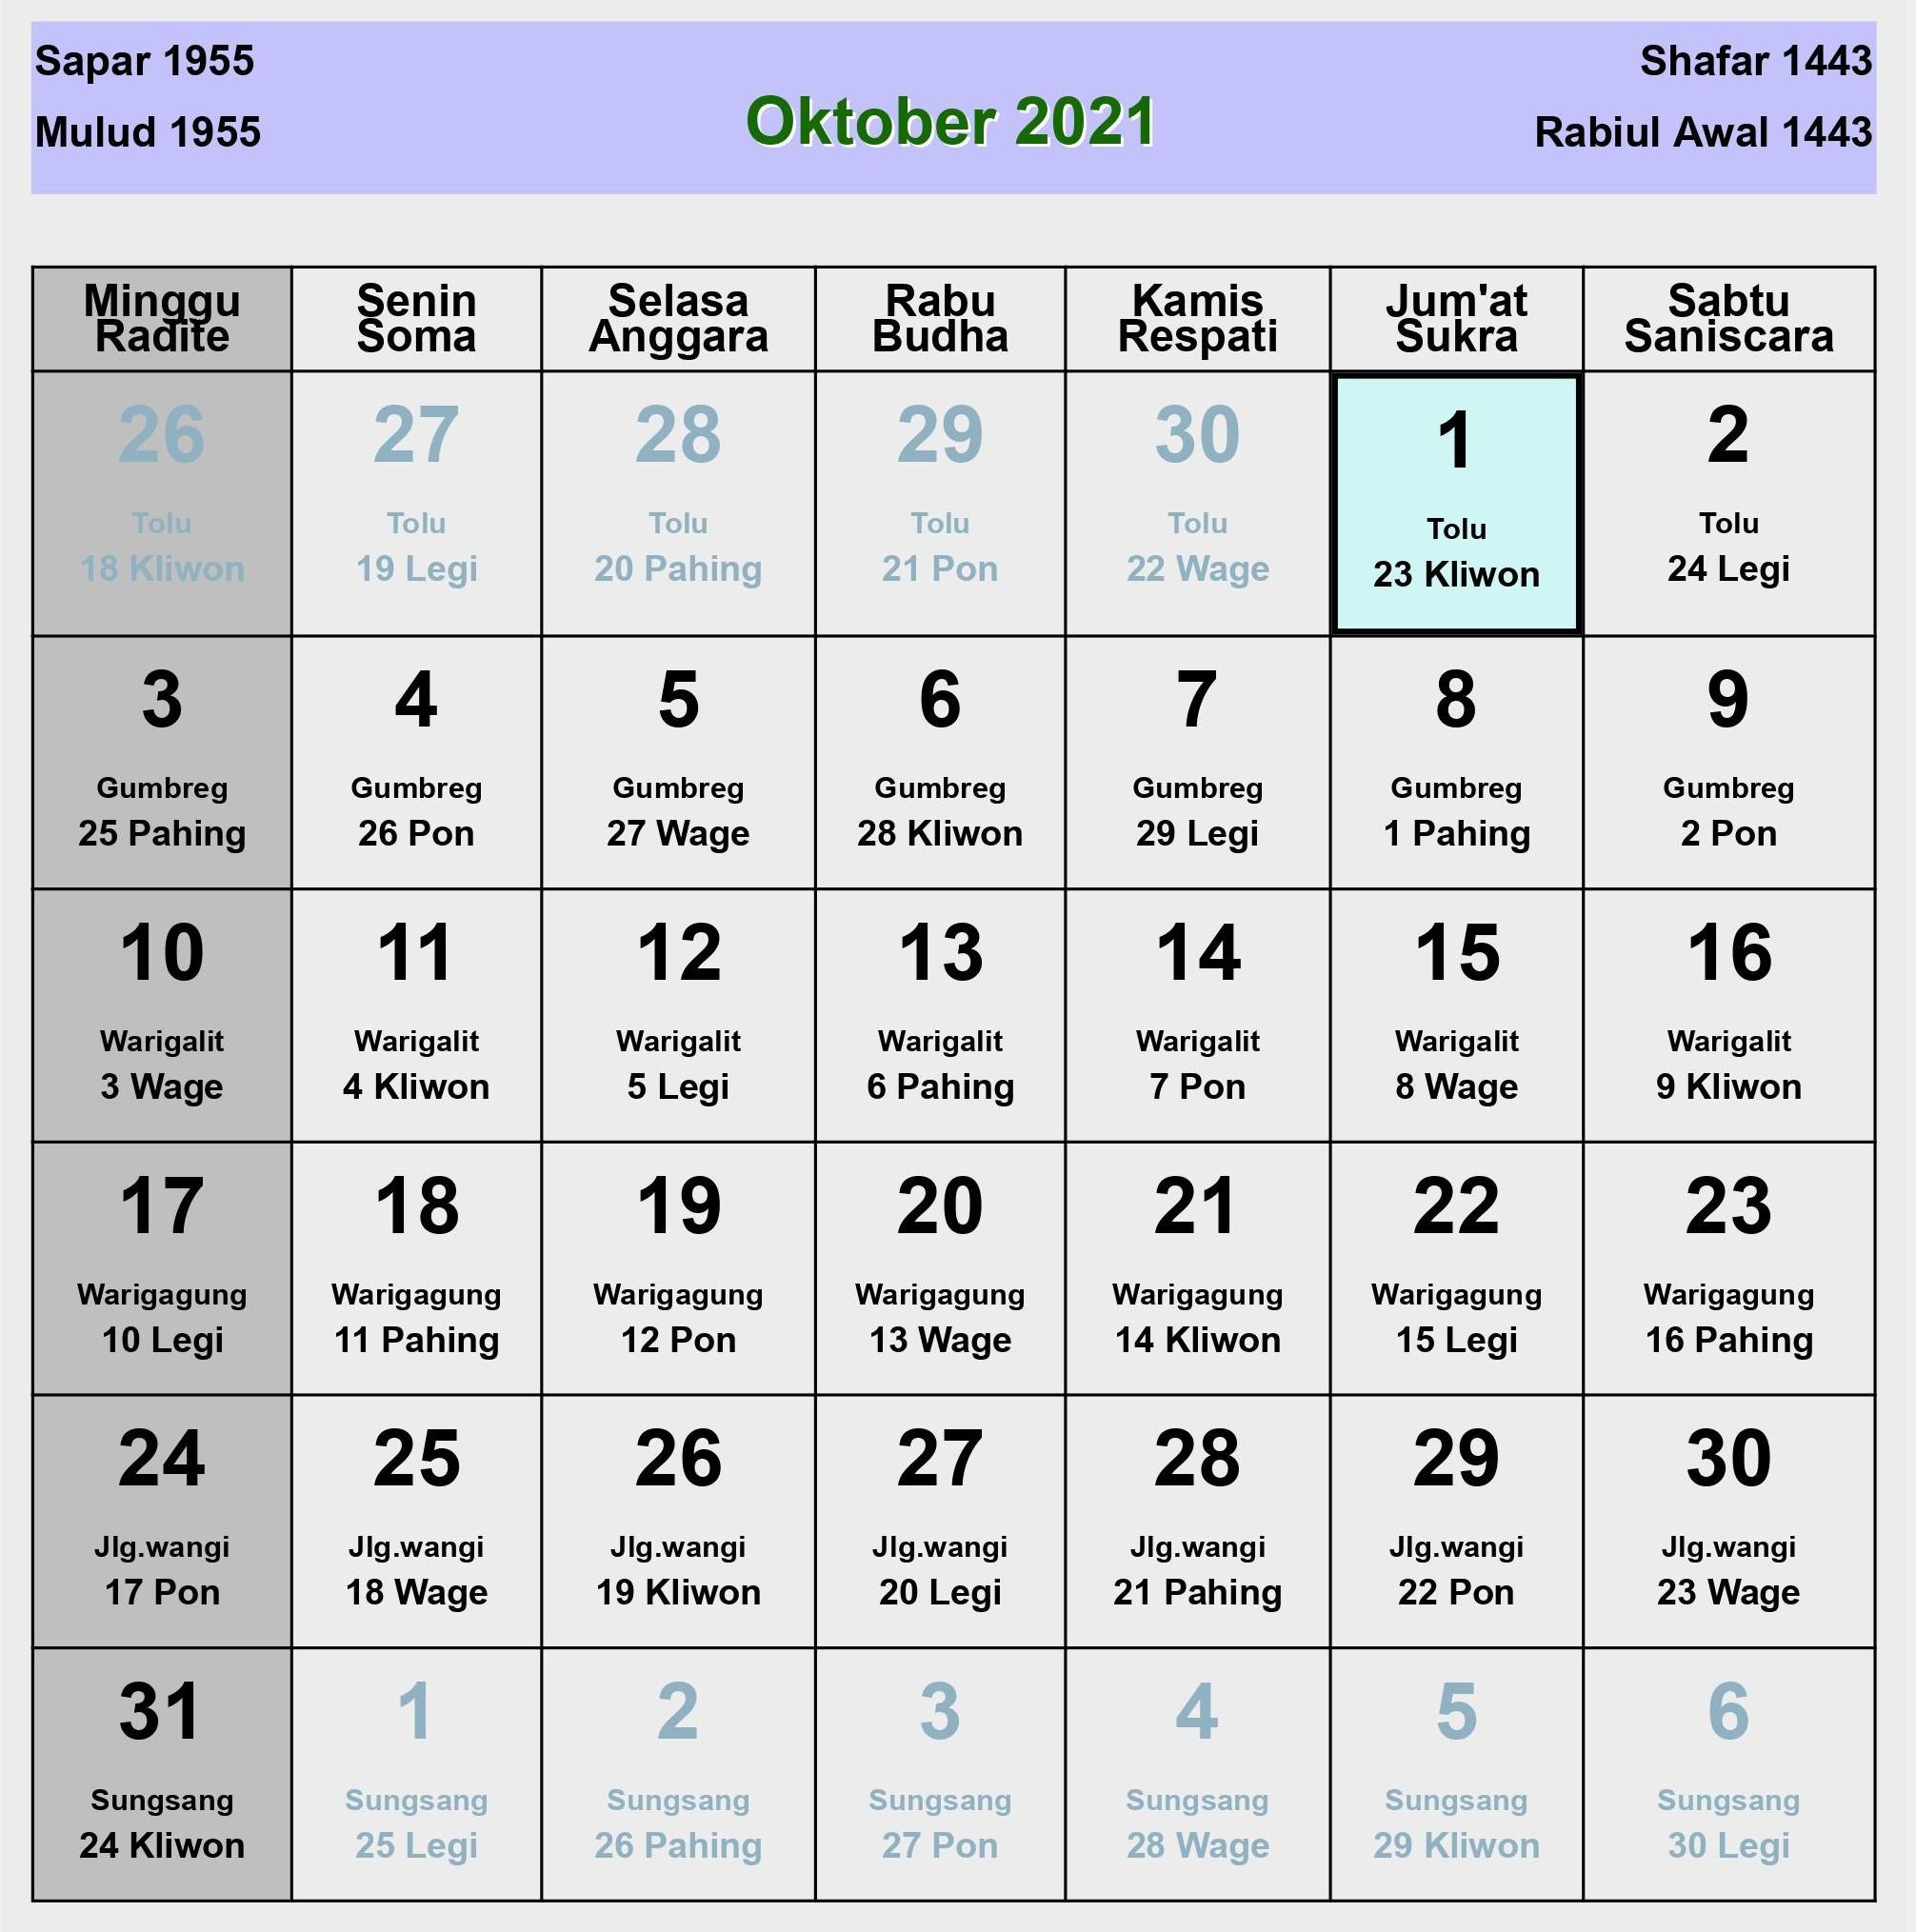 Kalender Jawa Oktober 2021 Lengkap Hari Baik Buruk Enkosa Com Informasi Kalender Dan Hari Besar Bulan Januari Hingga Desember 2021